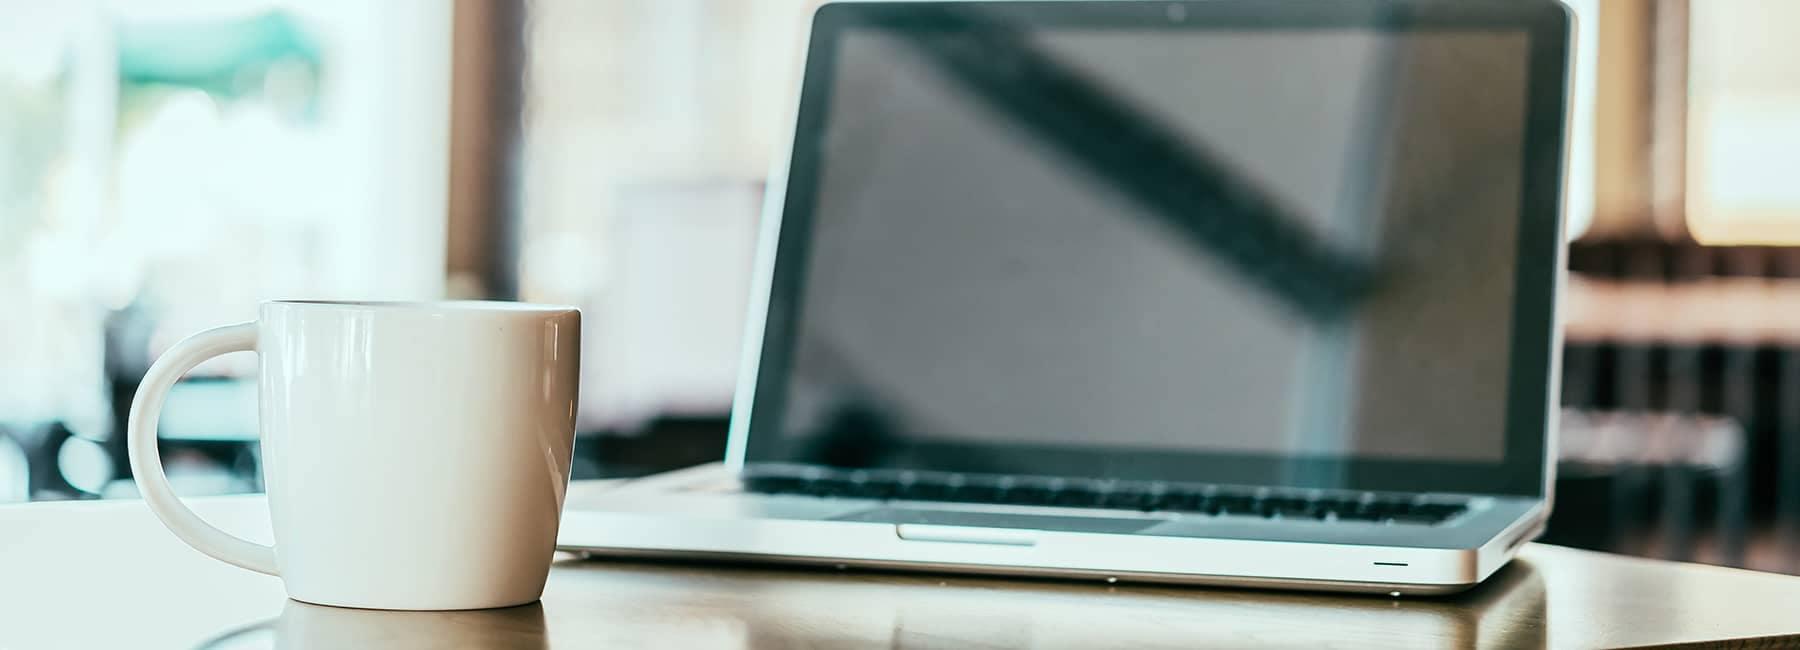 laptop and coffee mug